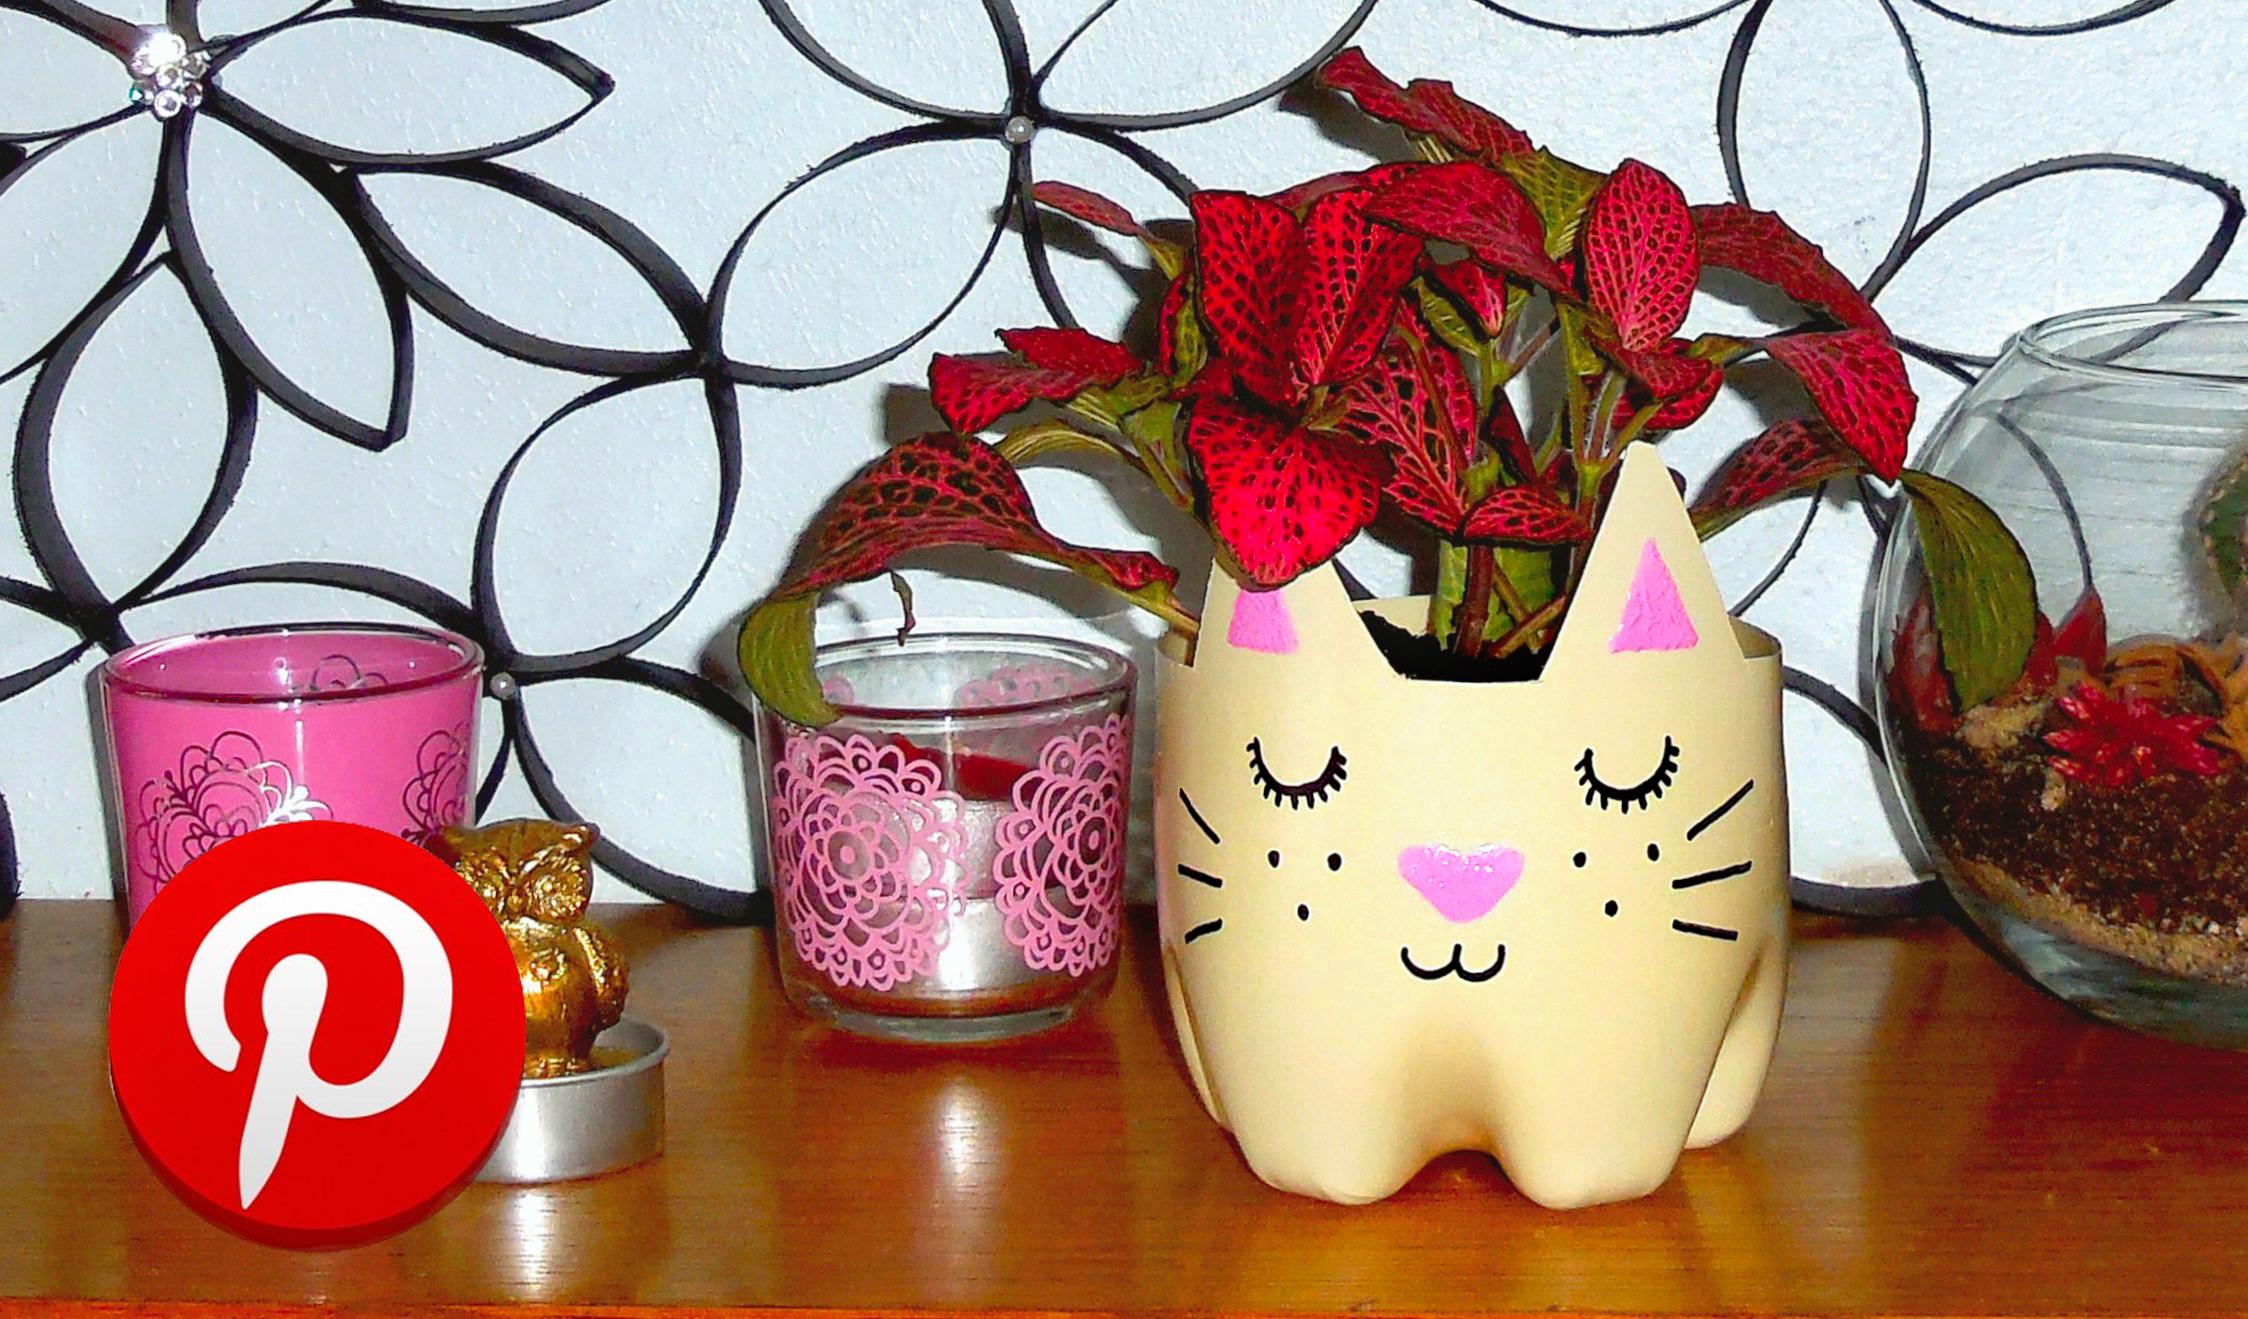 DIY cat planter! ❤ Pinterest recreation | DIY room decor